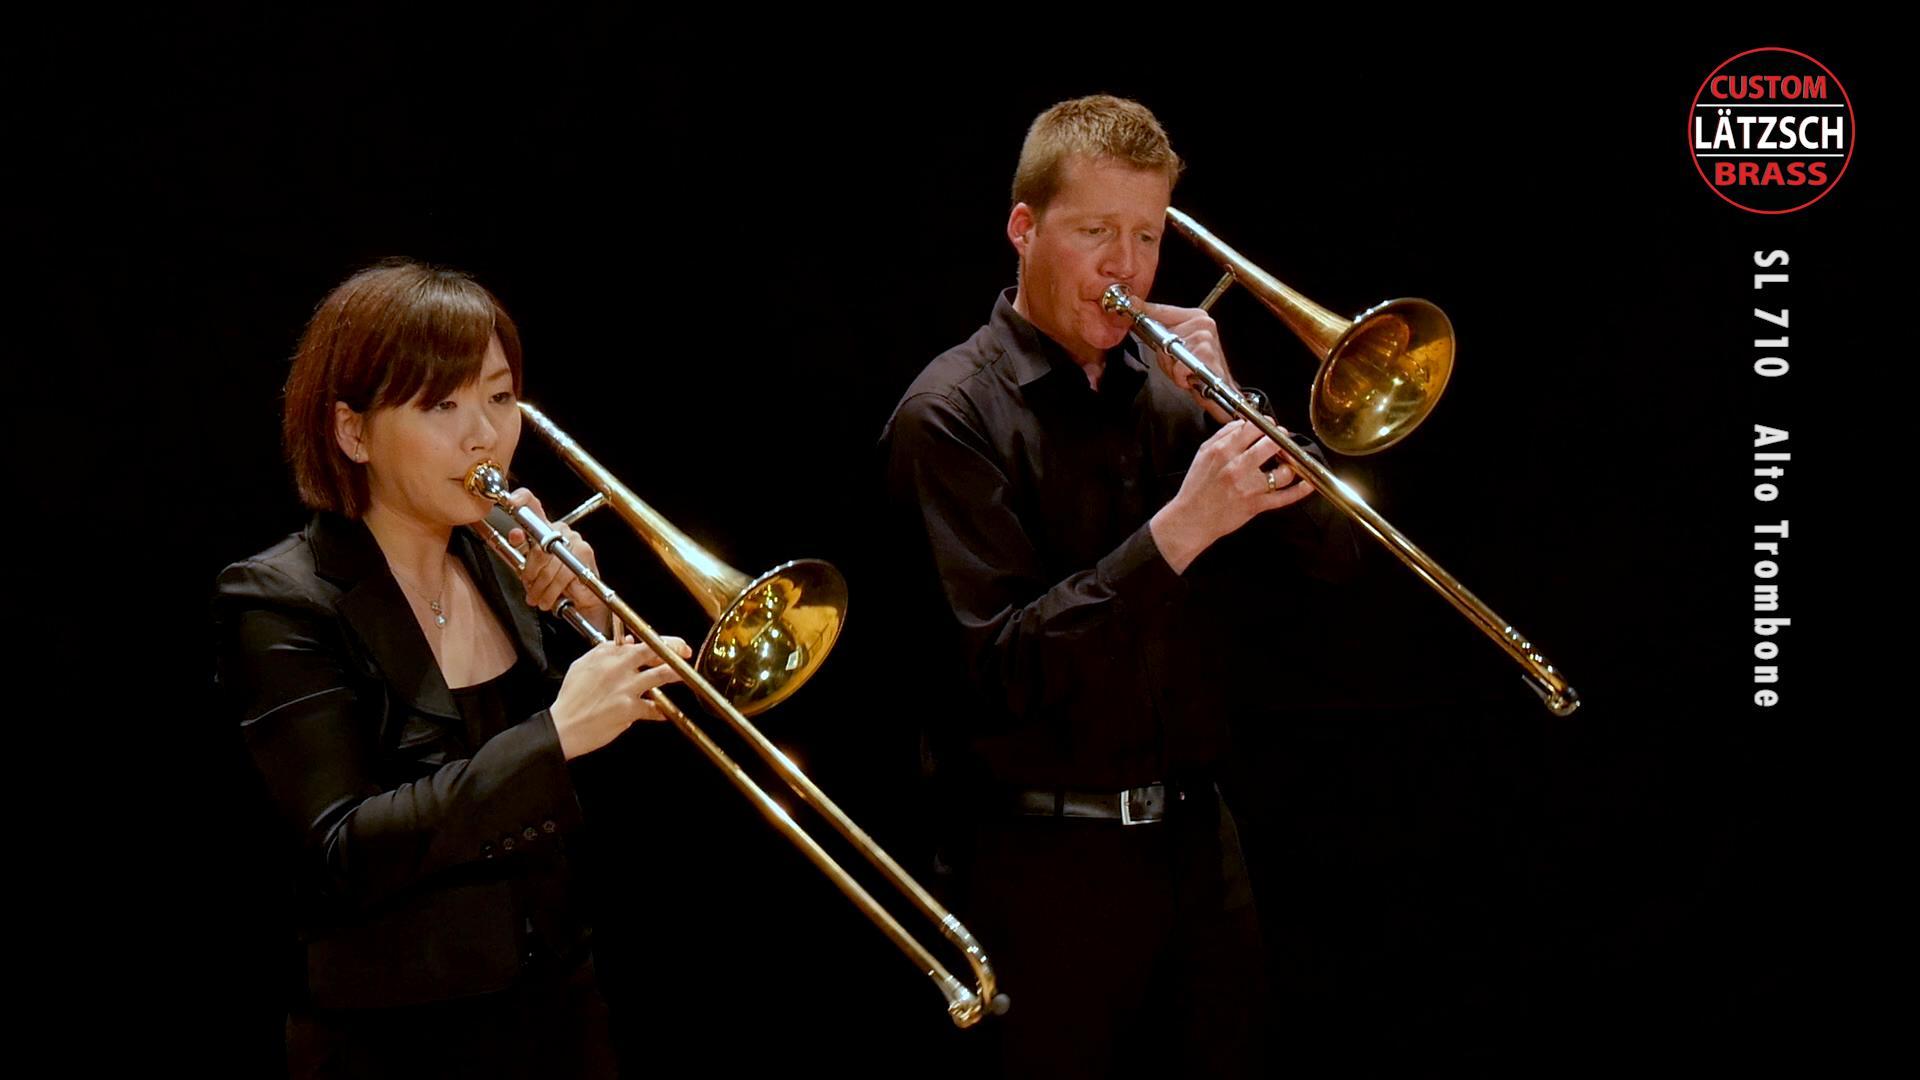 Lätzsch SL 710 Professional Alto Trombone